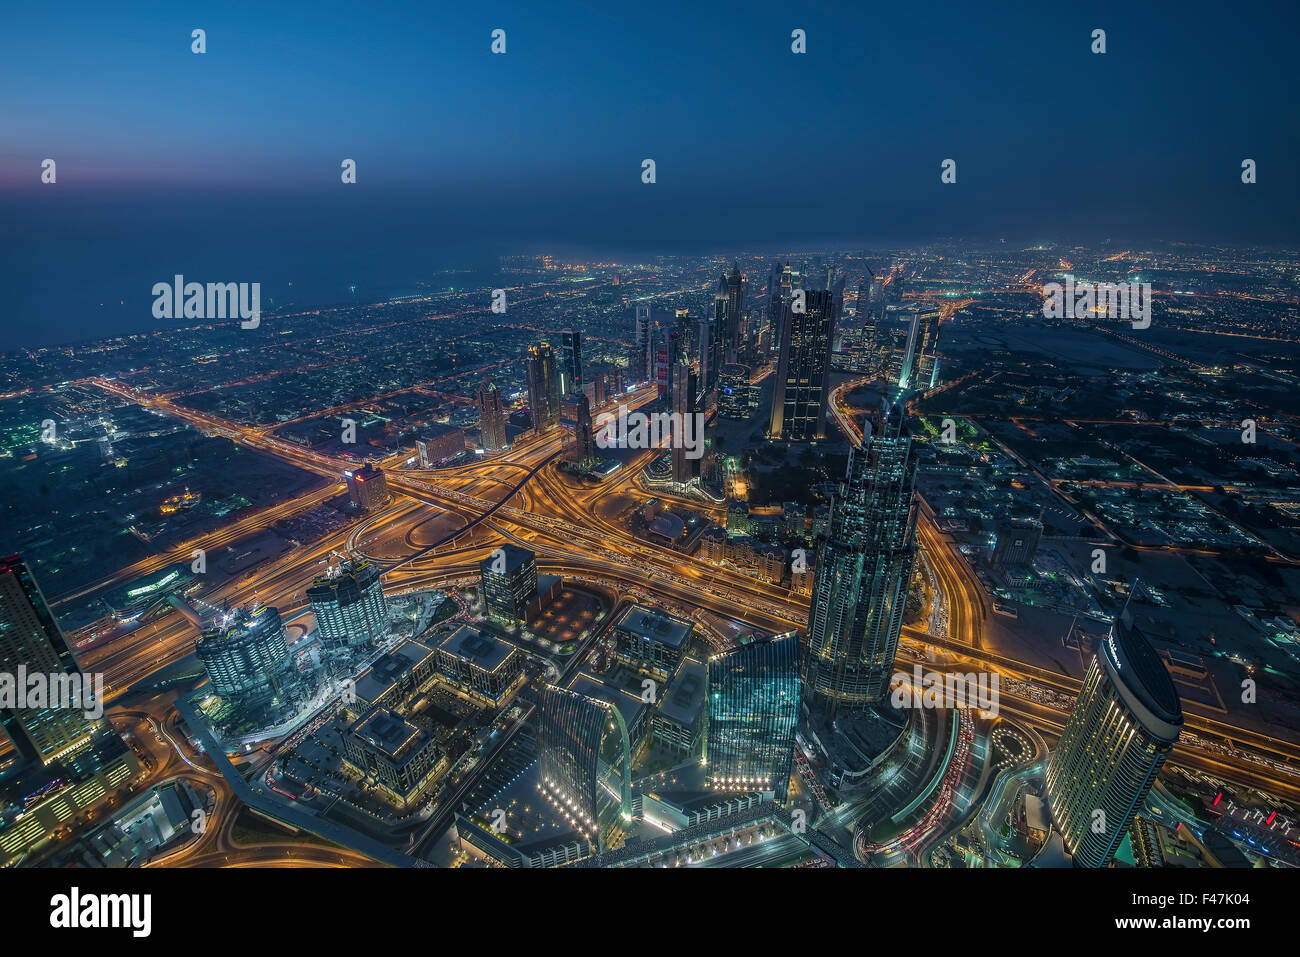 Dubai downtown viewed under the bridge - Stock Image